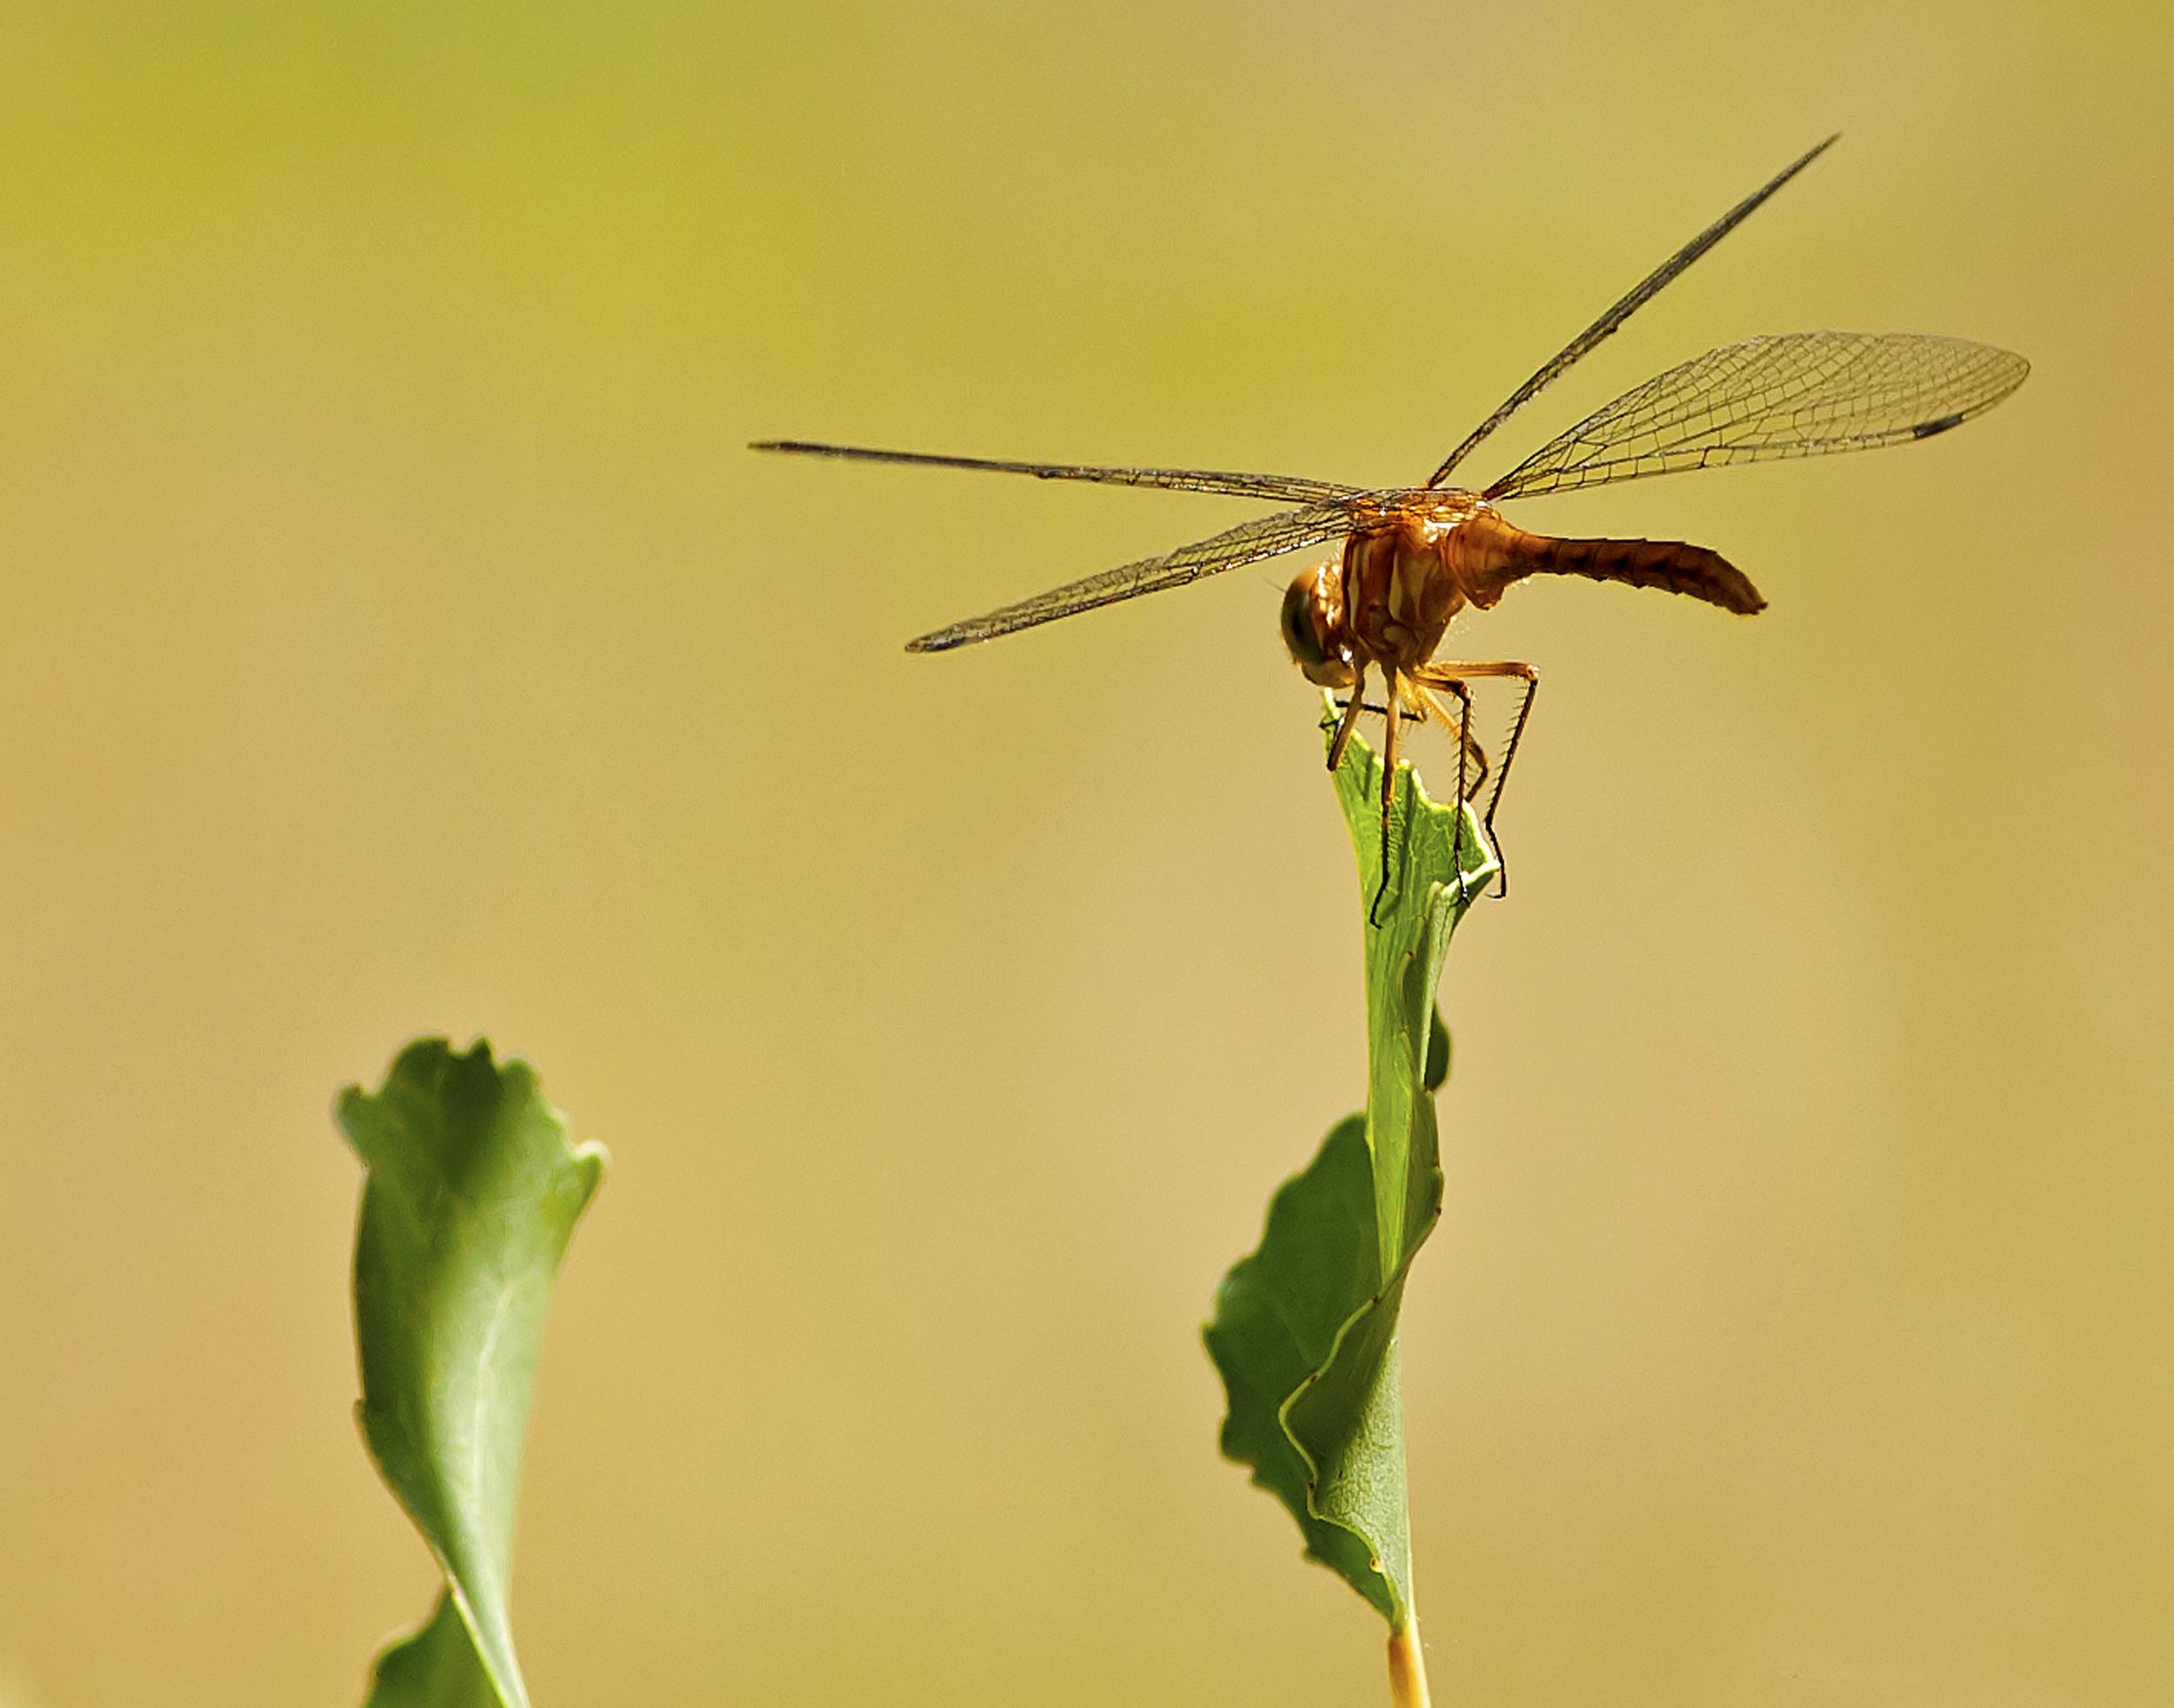 40 - Dragonfly